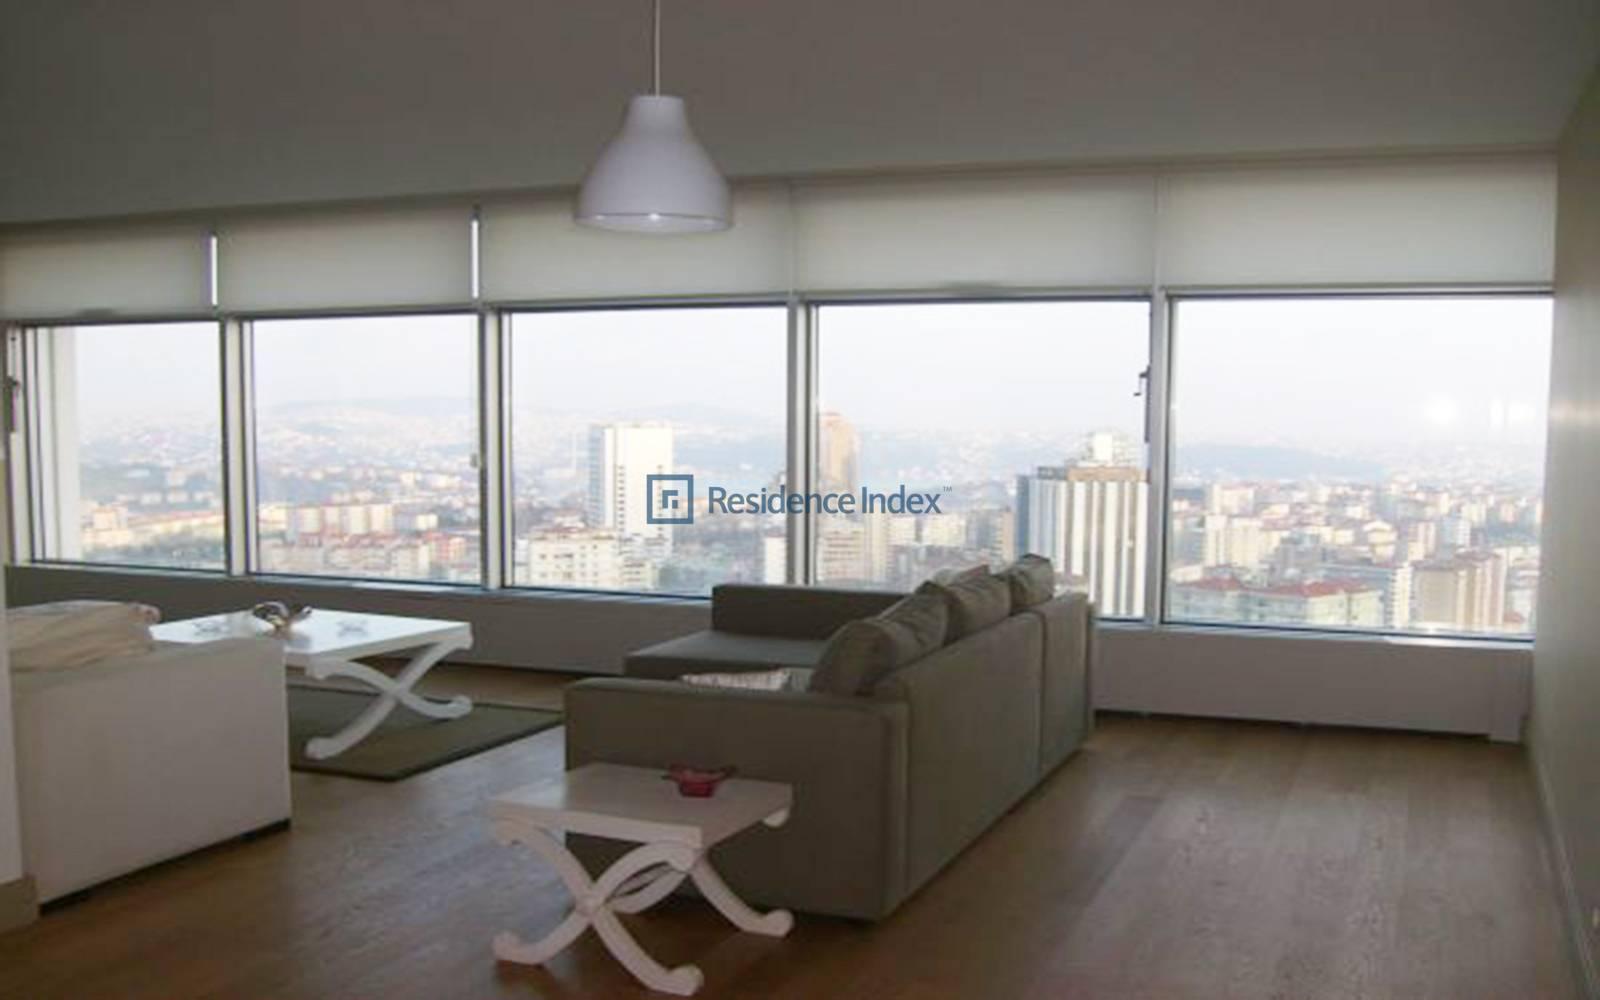 Astoria Kempinski - 4 + 1 330 m2 Investment Opportunity Apartment